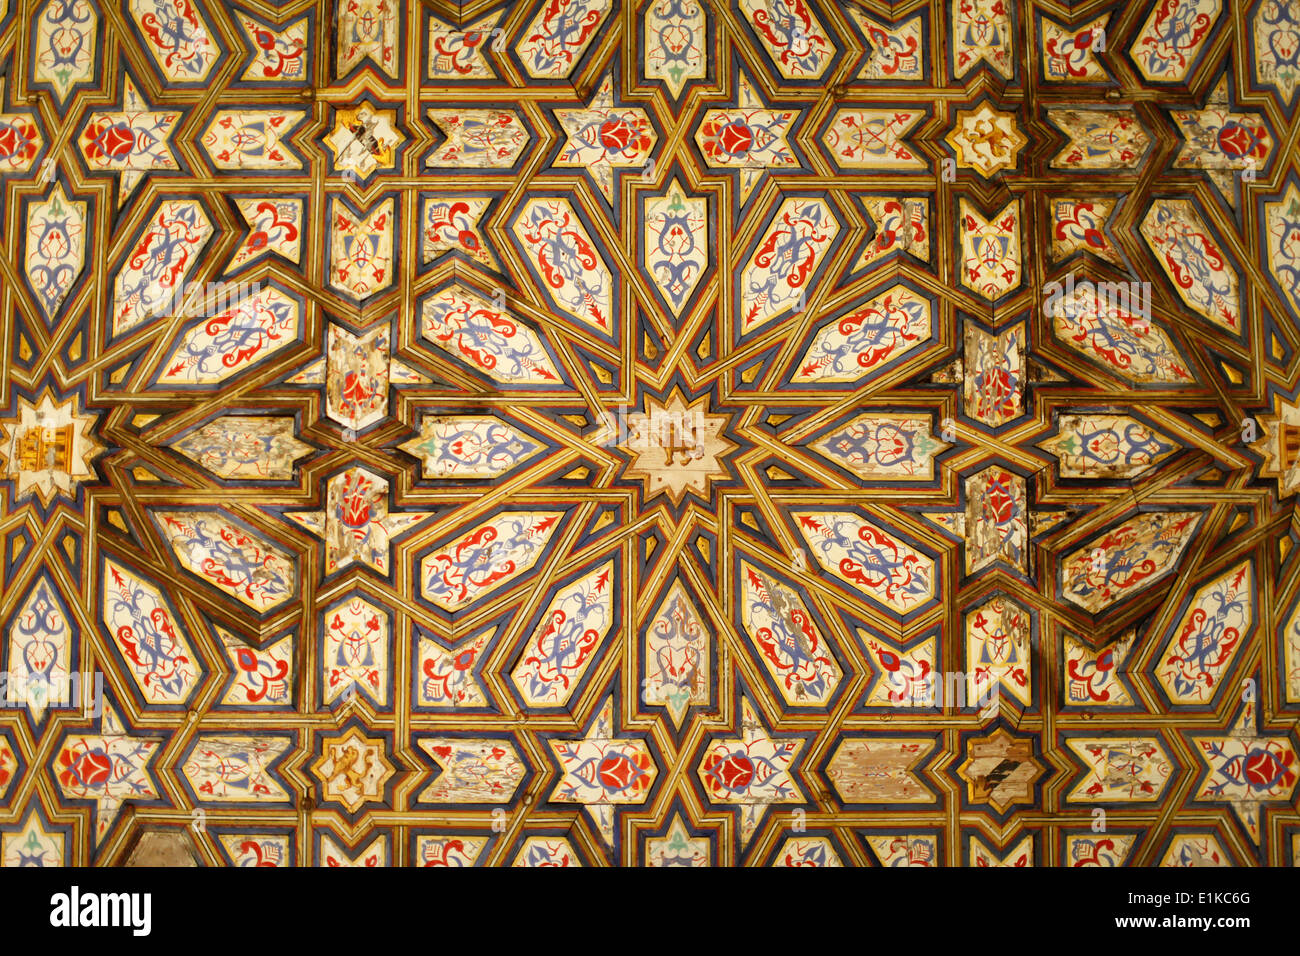 Real Alcazar de Sevilla - Infants' room ceiling decoration - Stock Image